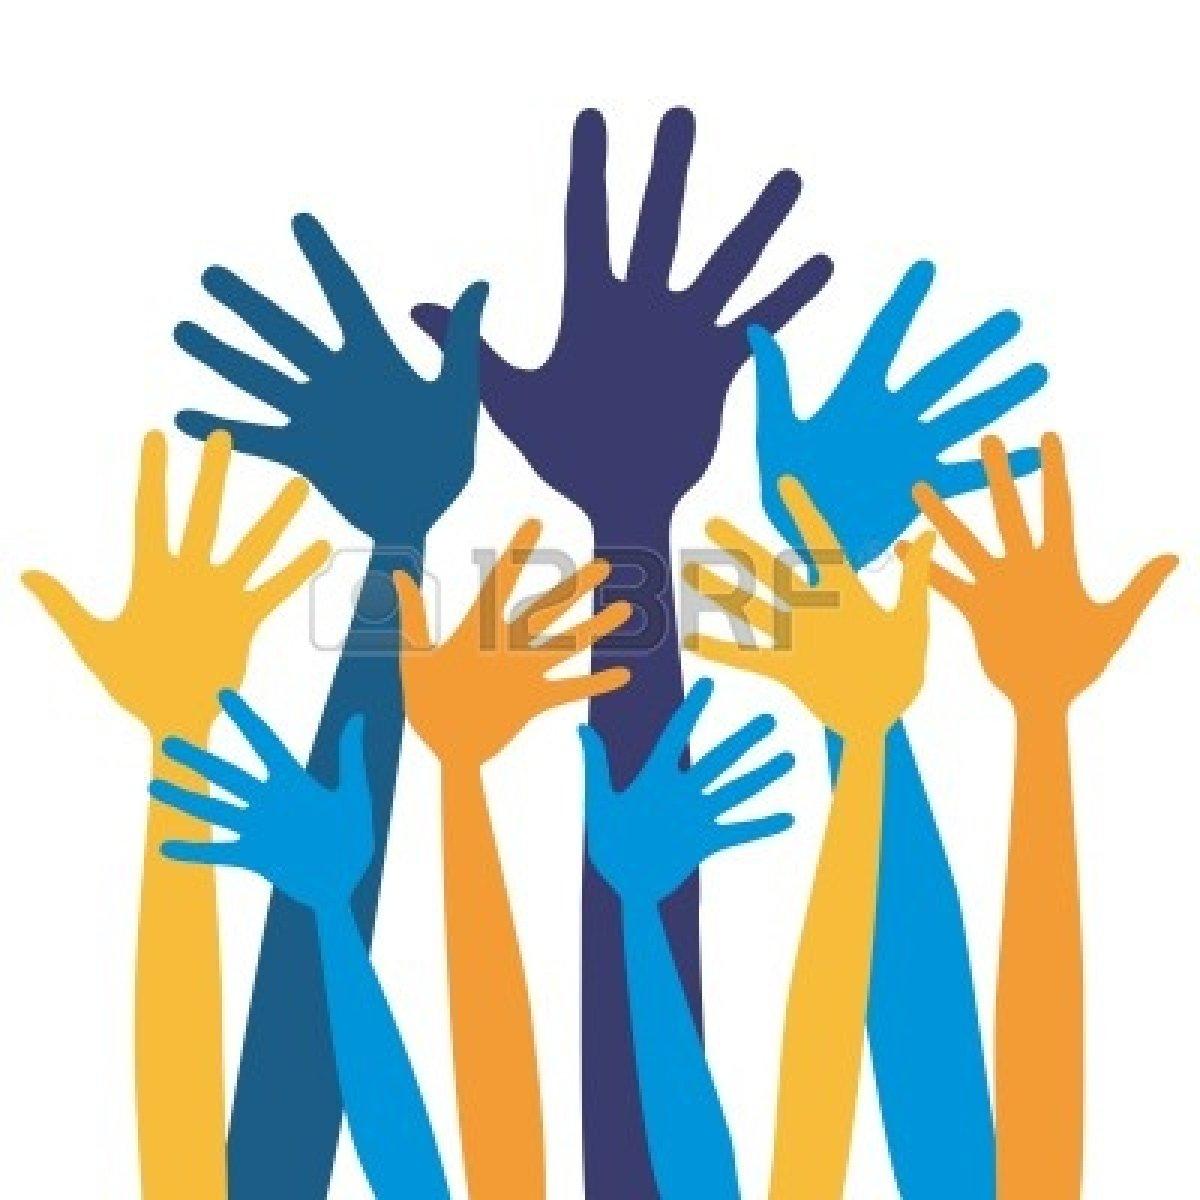 Worship hands clipart transparent Raised Hands Clipart | Free download best Raised Hands Clipart on ... transparent